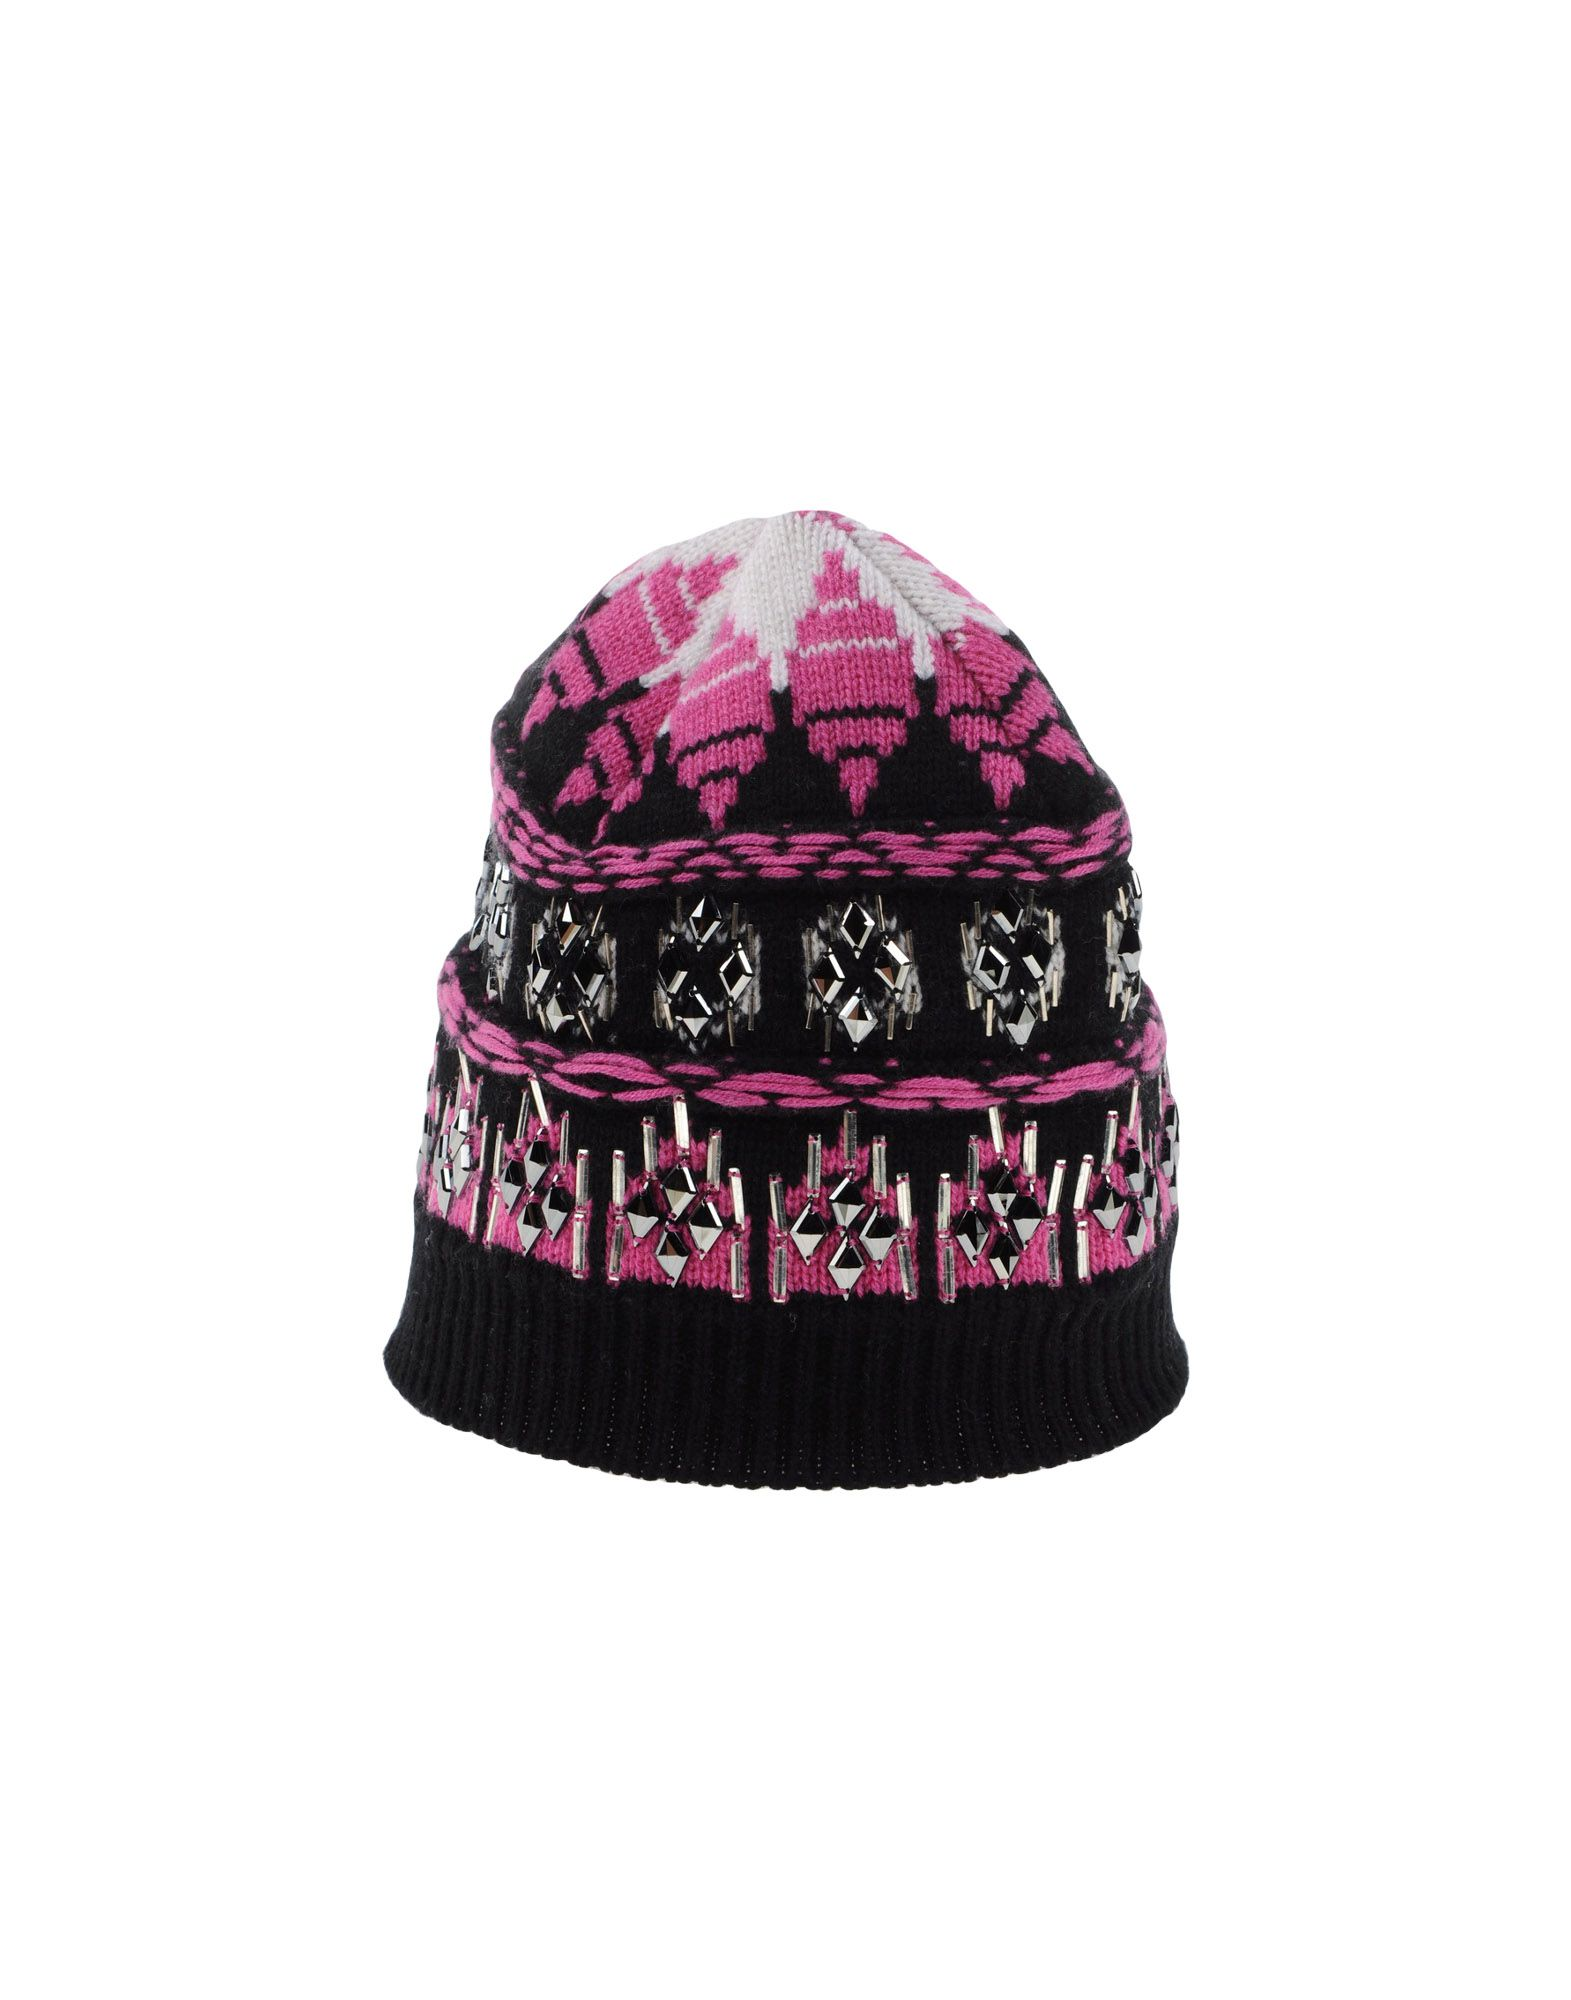 ccb8366a9c4 Emilio Pucci Hat - Women Emilio Pucci Hats online on YOOX United ...